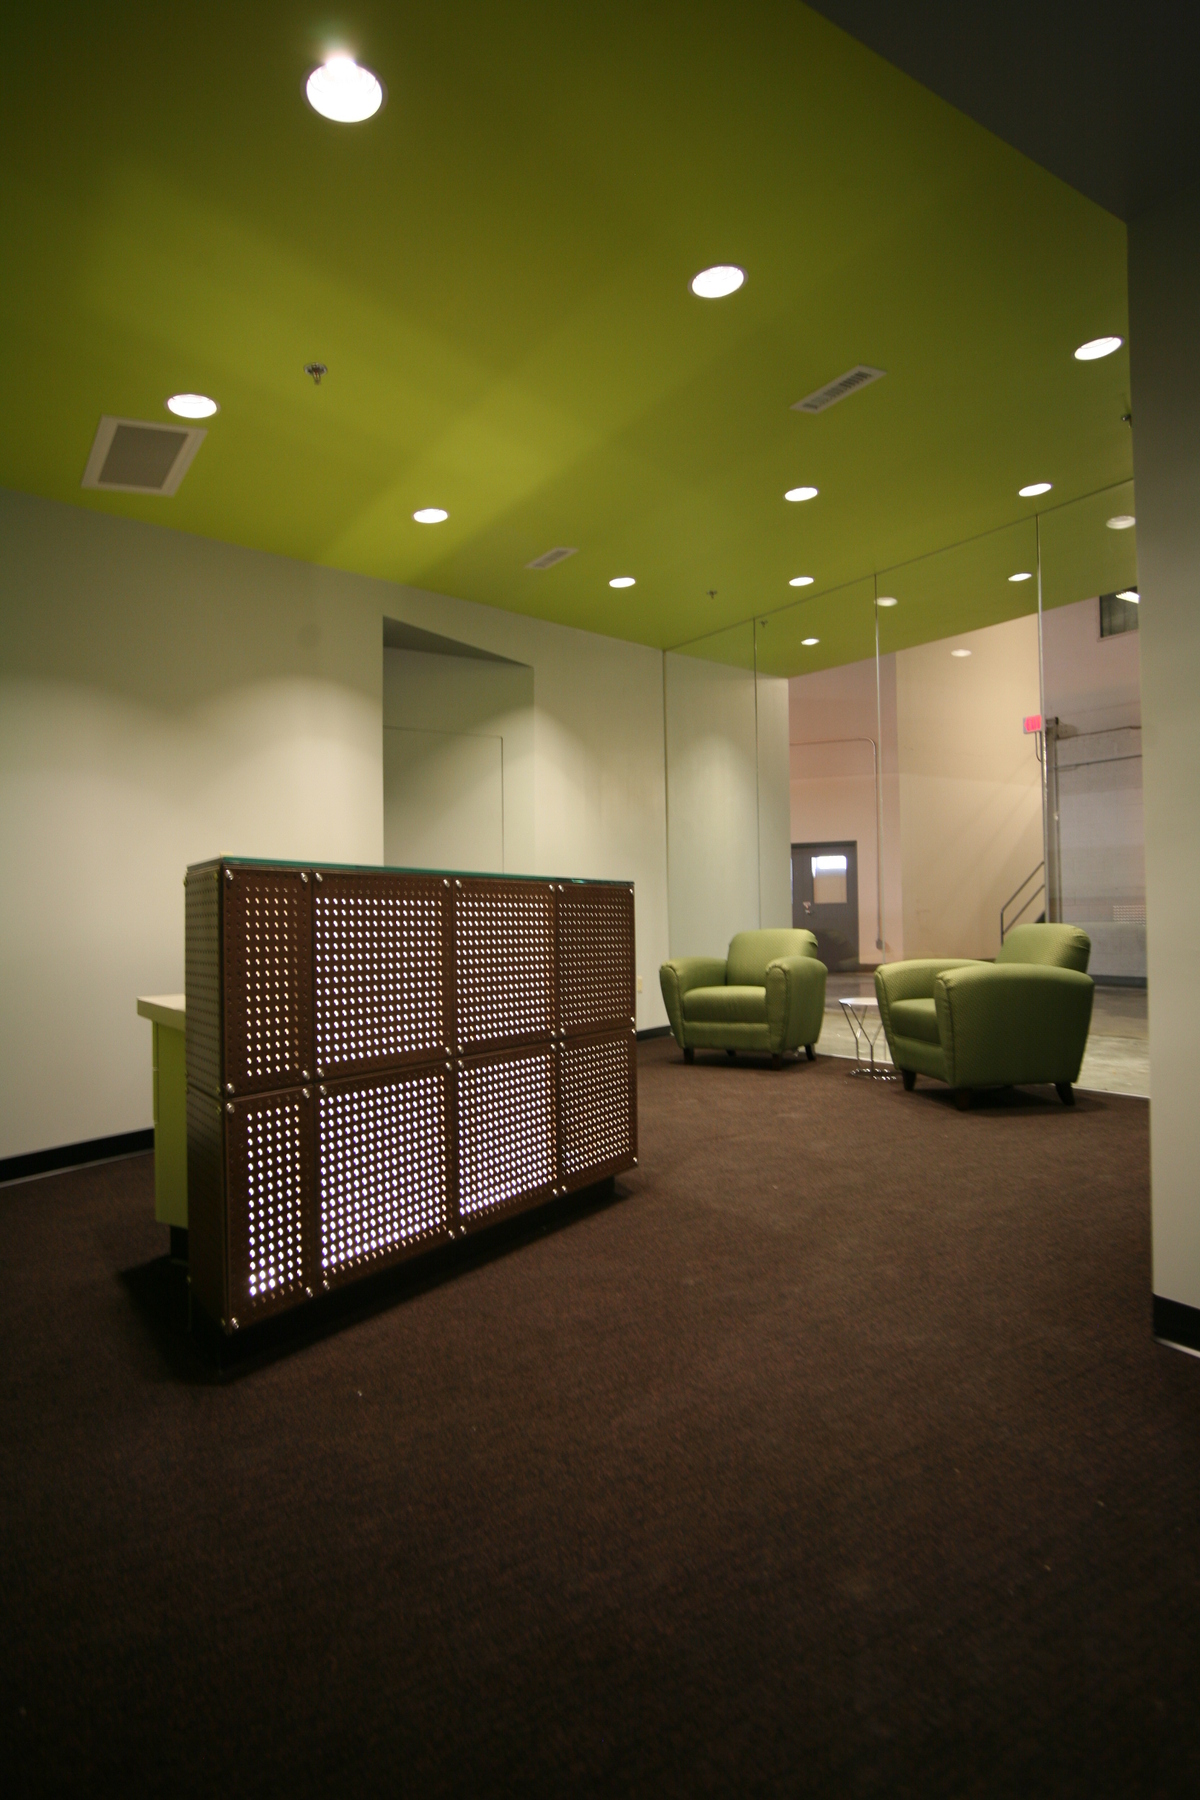 Lobby with Reception Desk